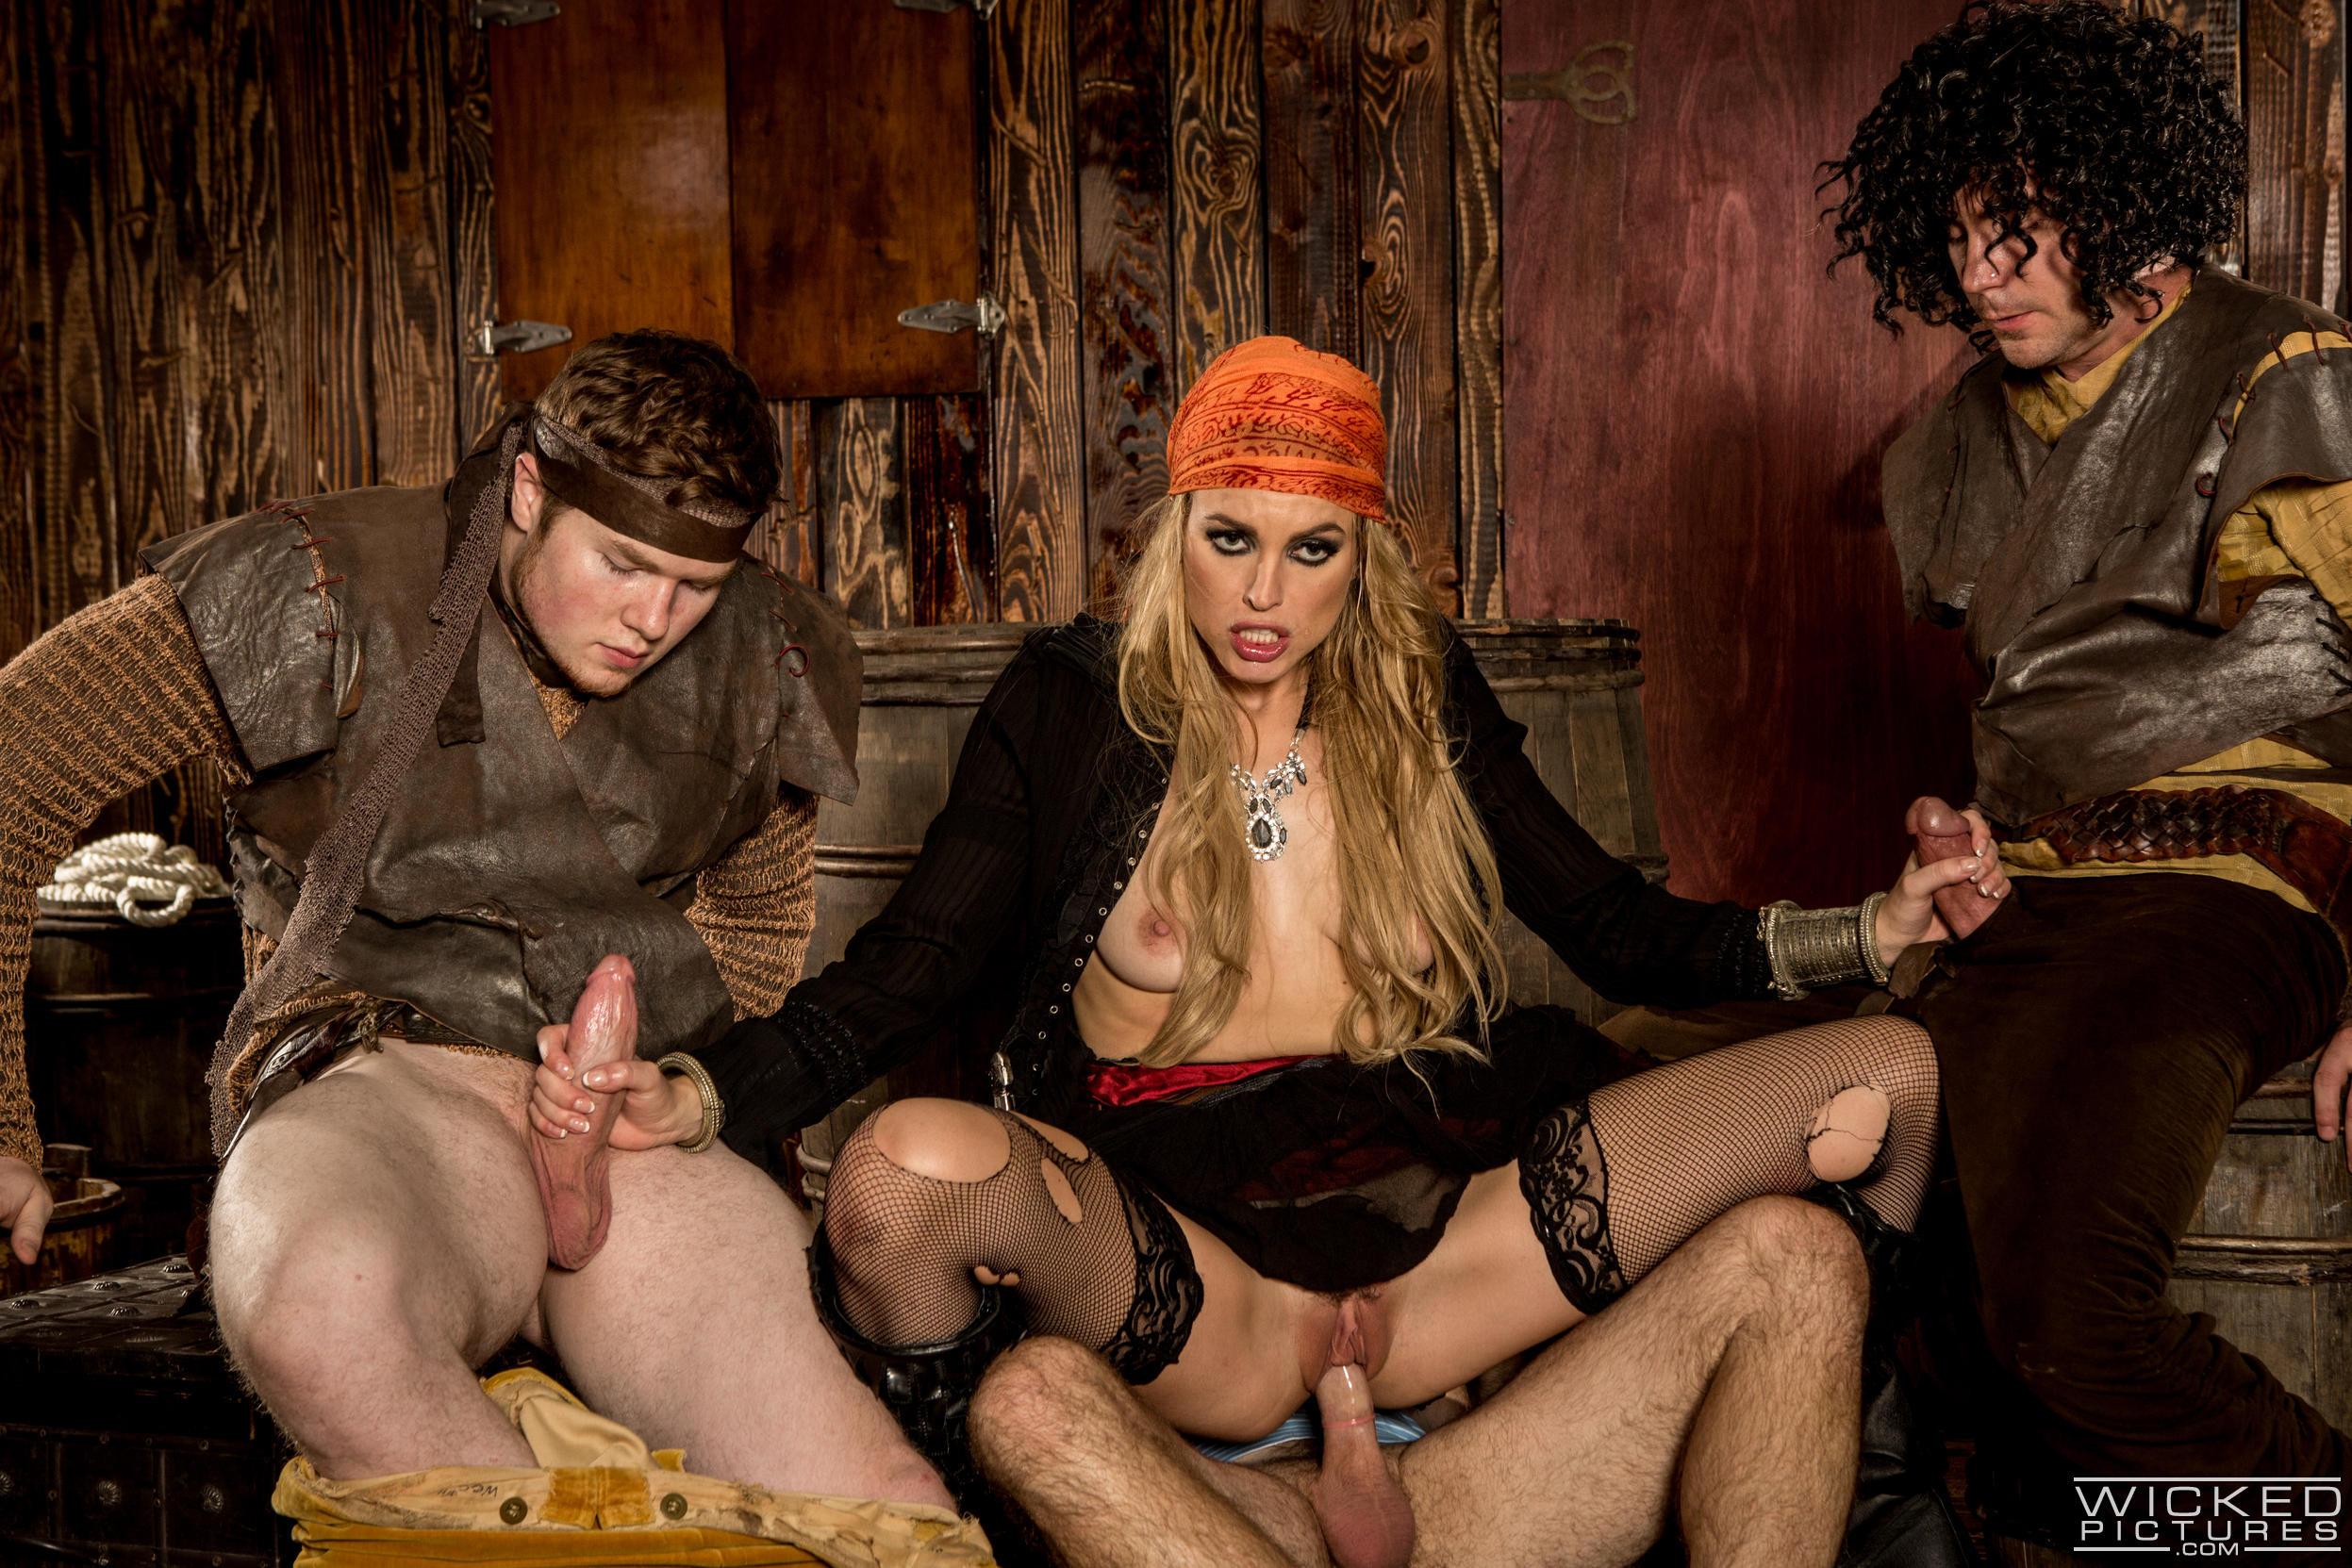 russkie-seks-parodiya-na-russkom-yazike-smotret-seks-video-yaponok-lesbiyanok